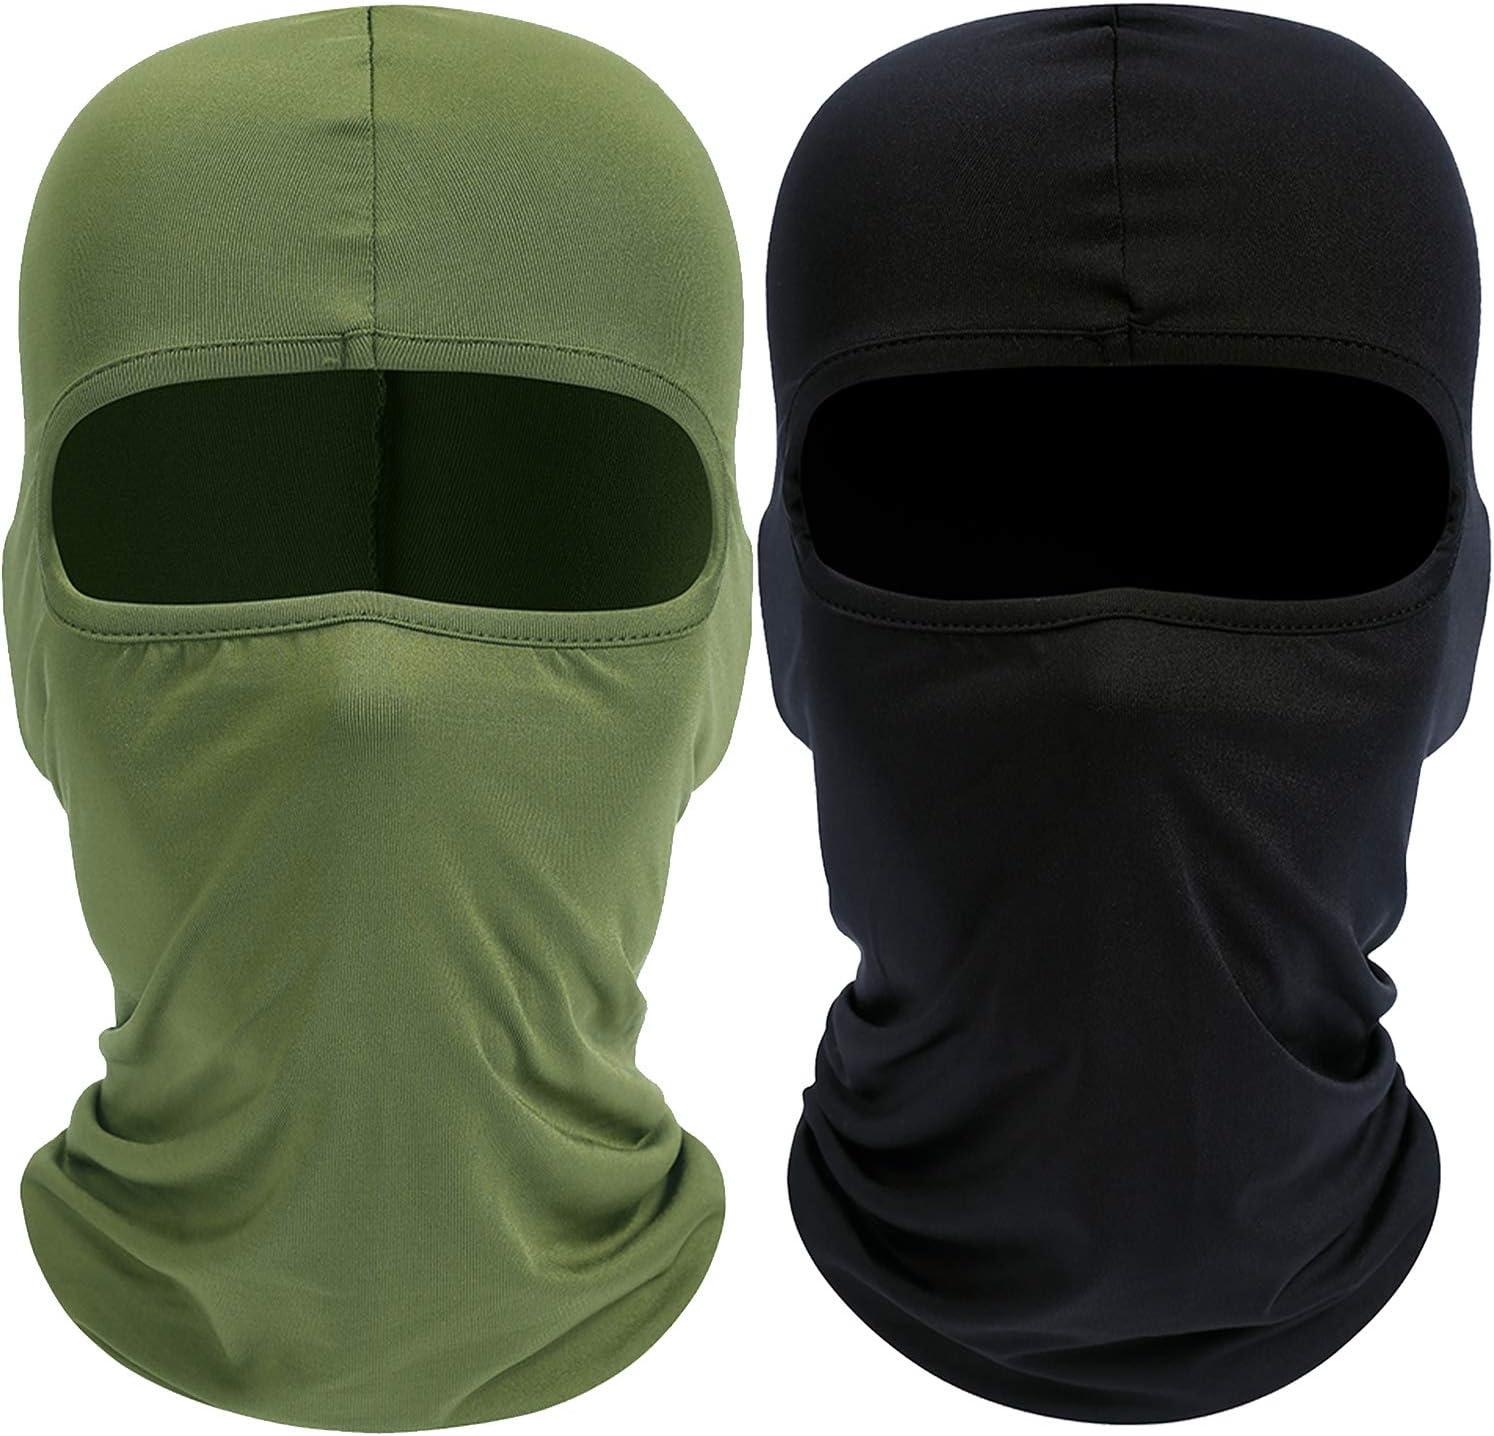 Your Choice Balaclava Ski Face Mask UV Protection, Set of 2 Black and Green